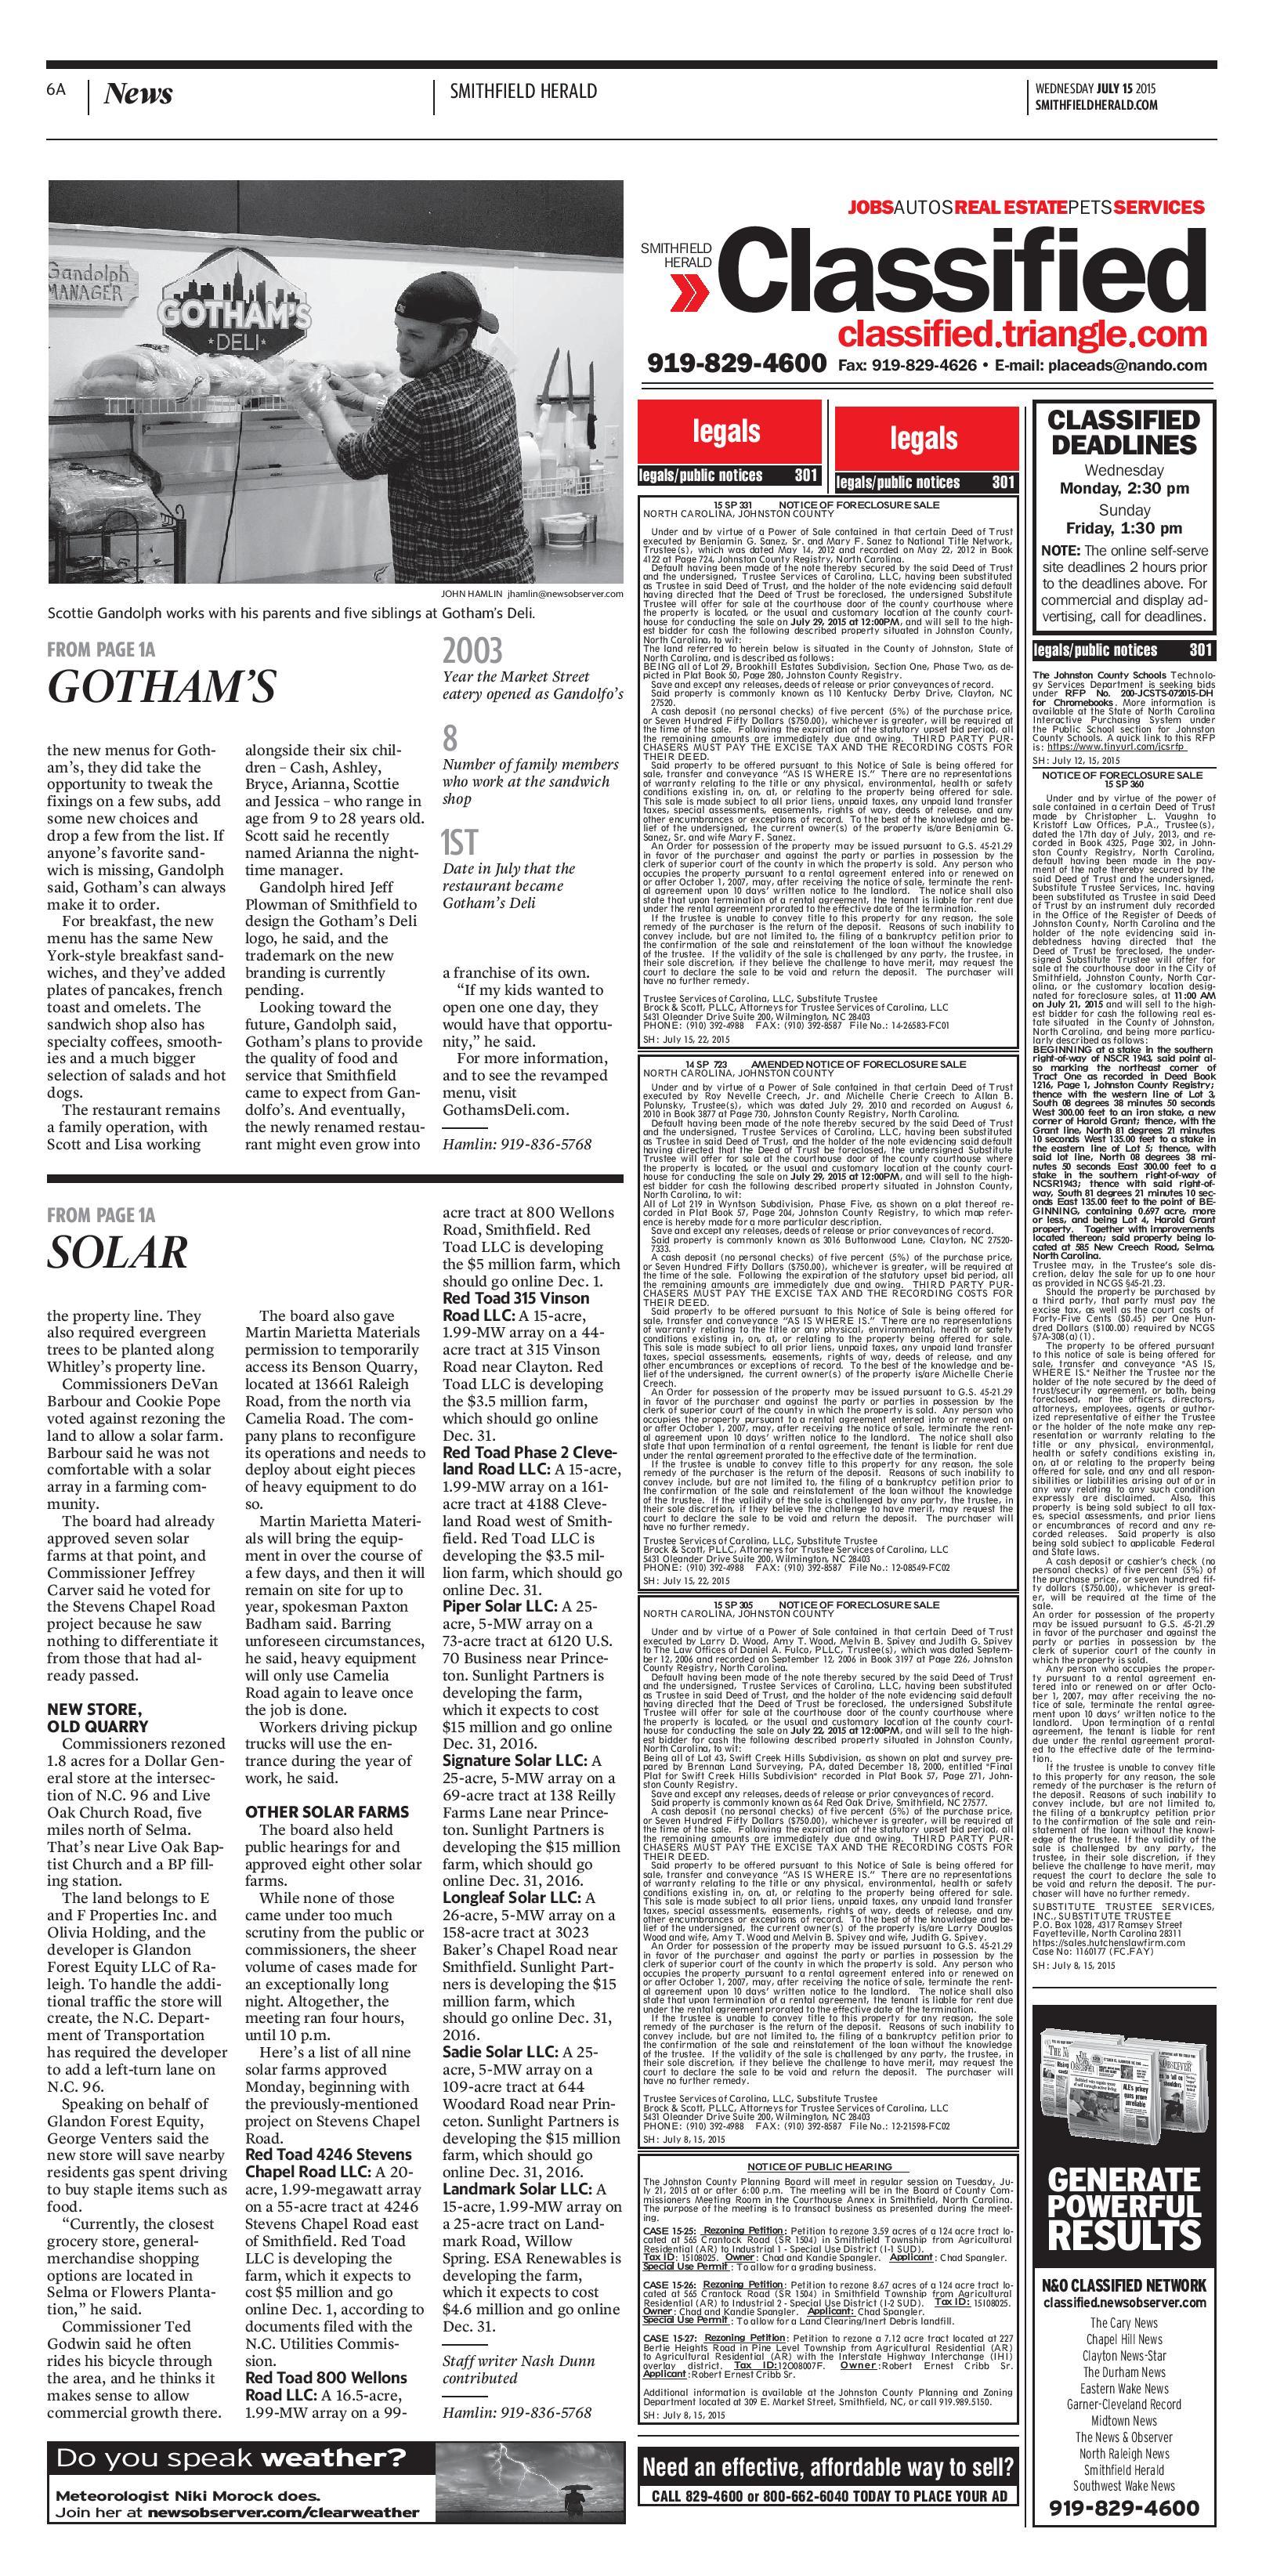 gotham story page 2